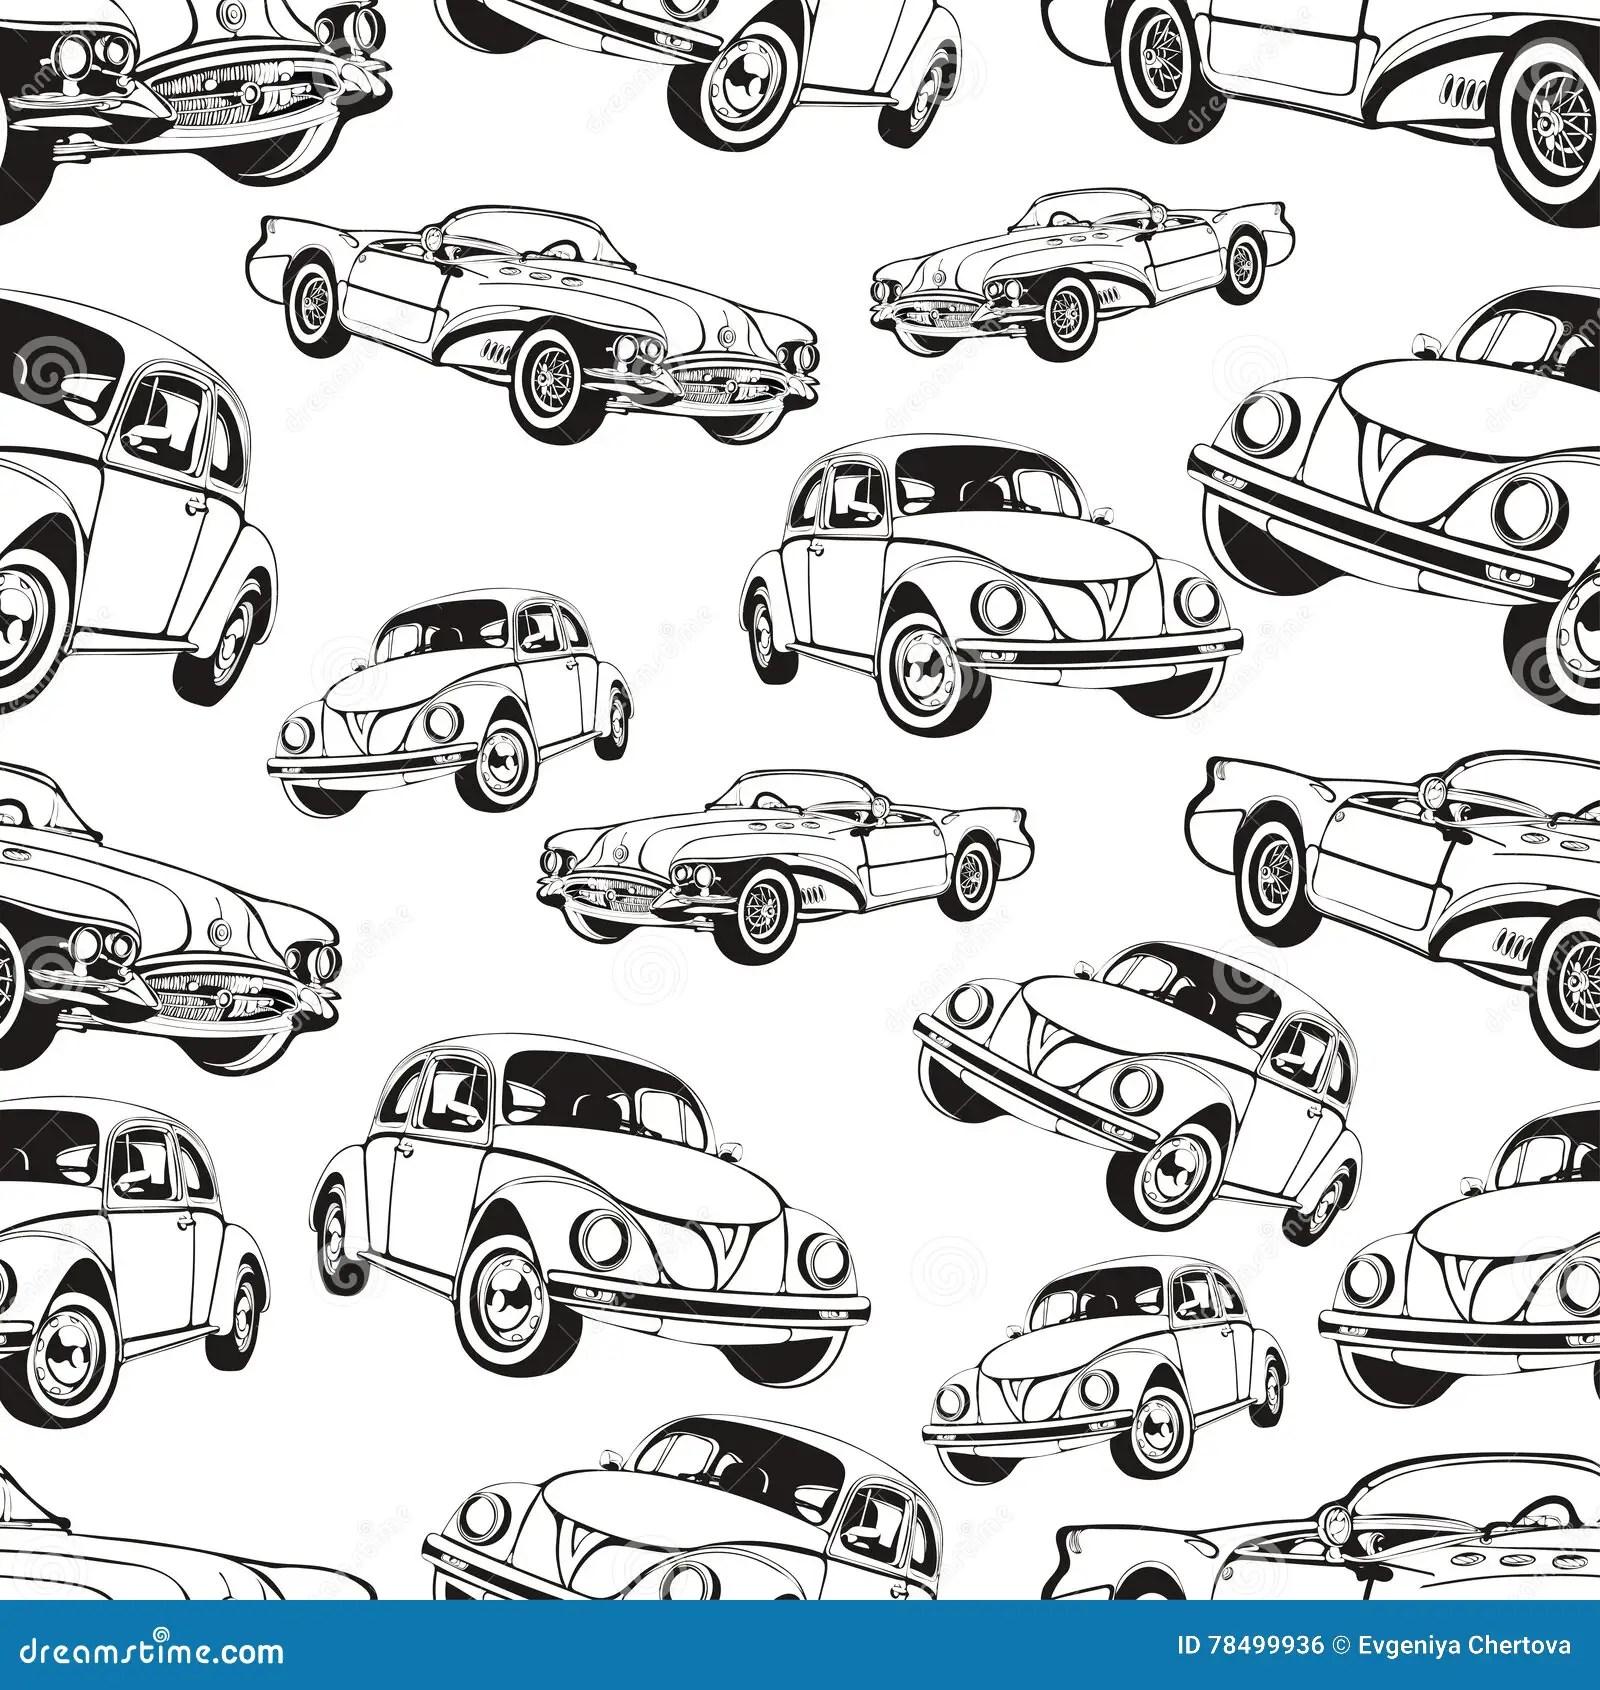 wallpaper dream cars